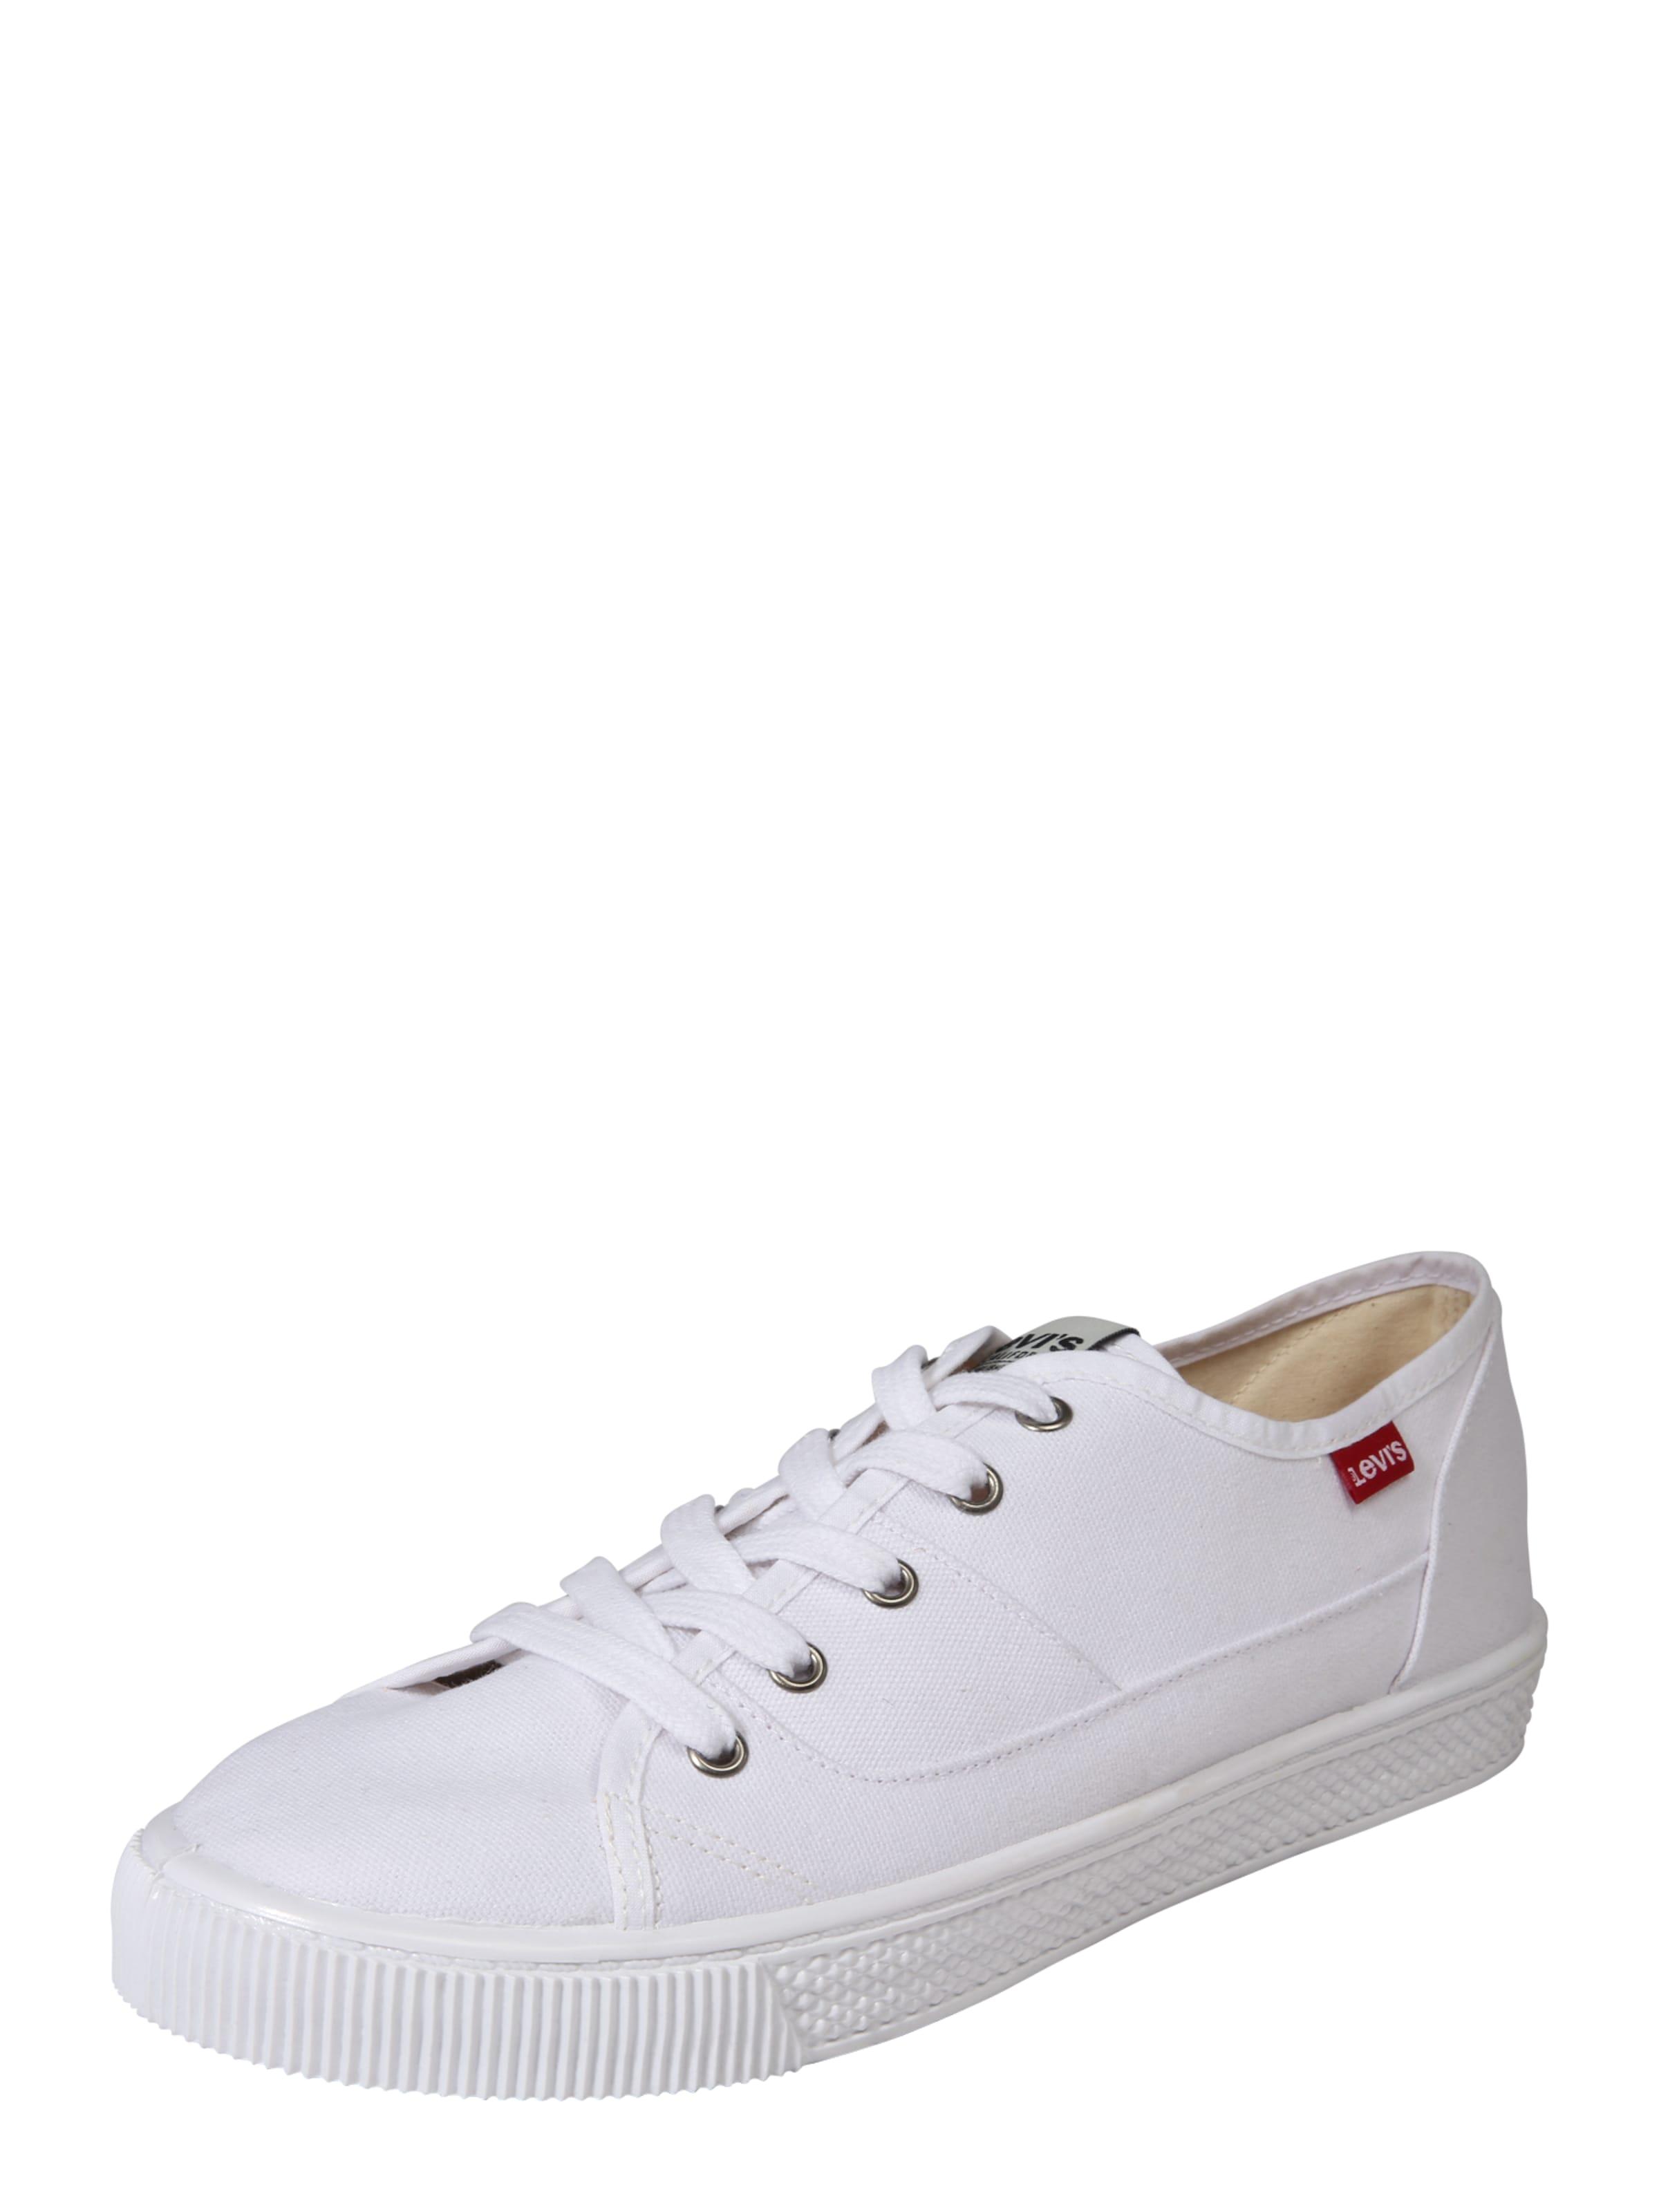 Haltbare Mode billige Schuhe LEVI'S | Canvas-Sneaker 'Malibu' Schuhe Gut getragene Schuhe